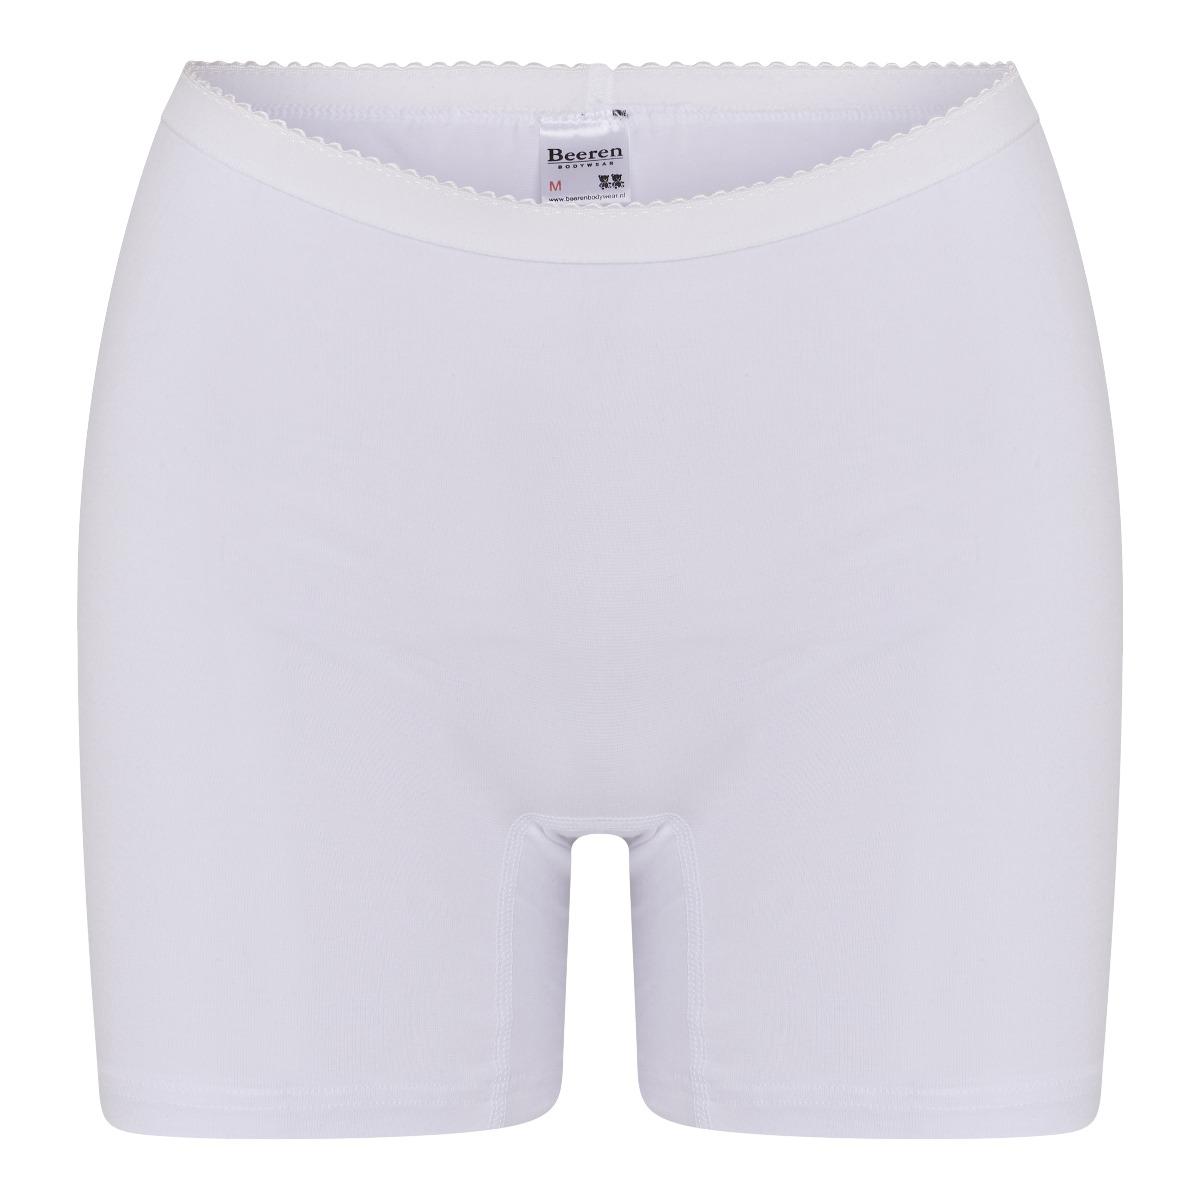 Beeren Softly Dames Boxer Wit XL